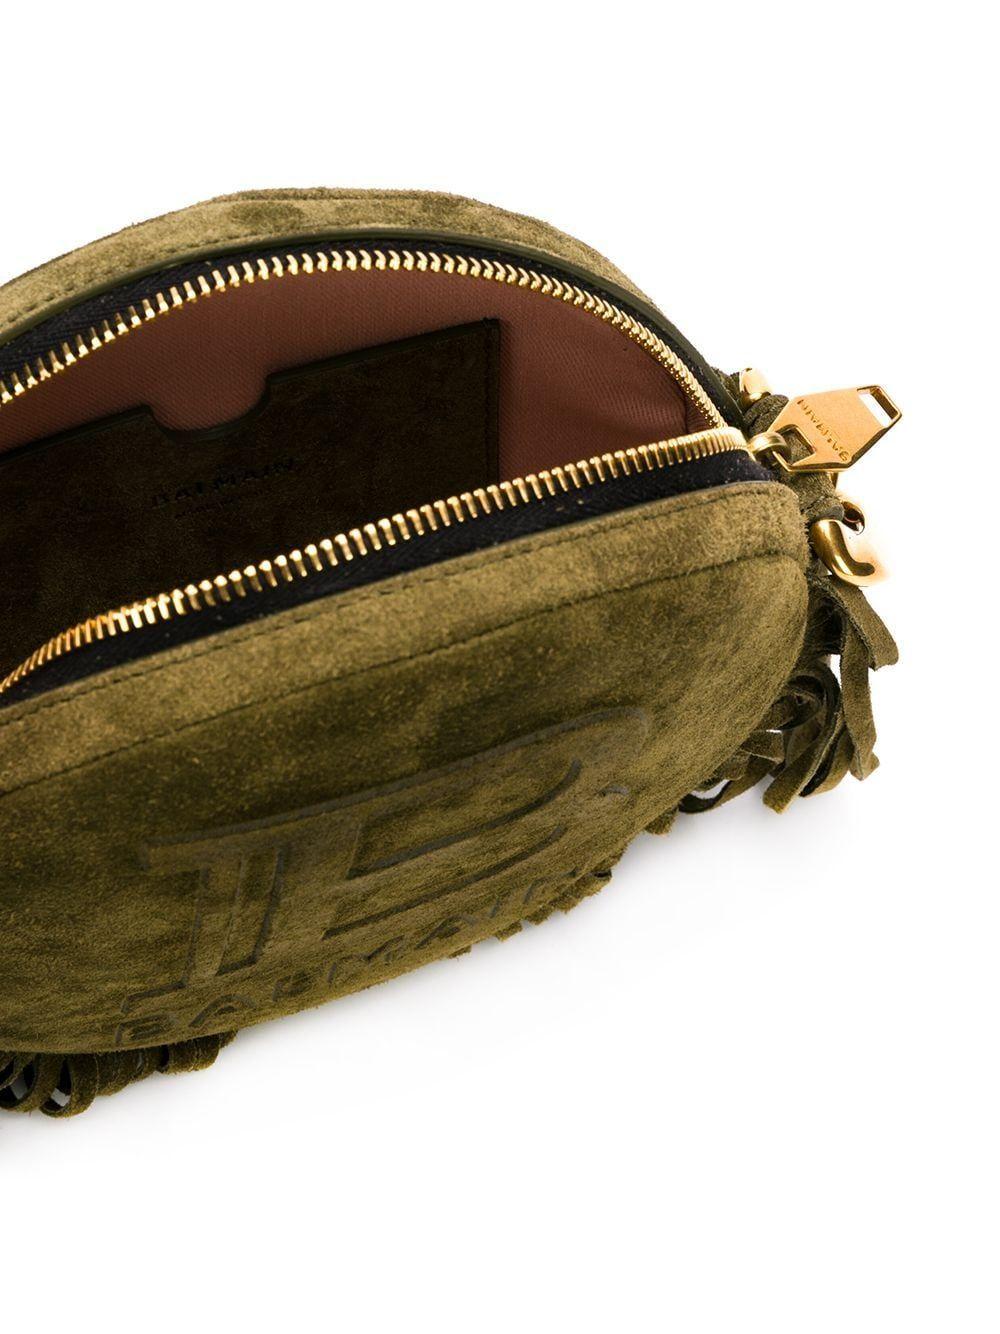 BALMAIN WOMEN'S TN1S423LLCH7UA GREEN LEATHER SHOULDER BAG